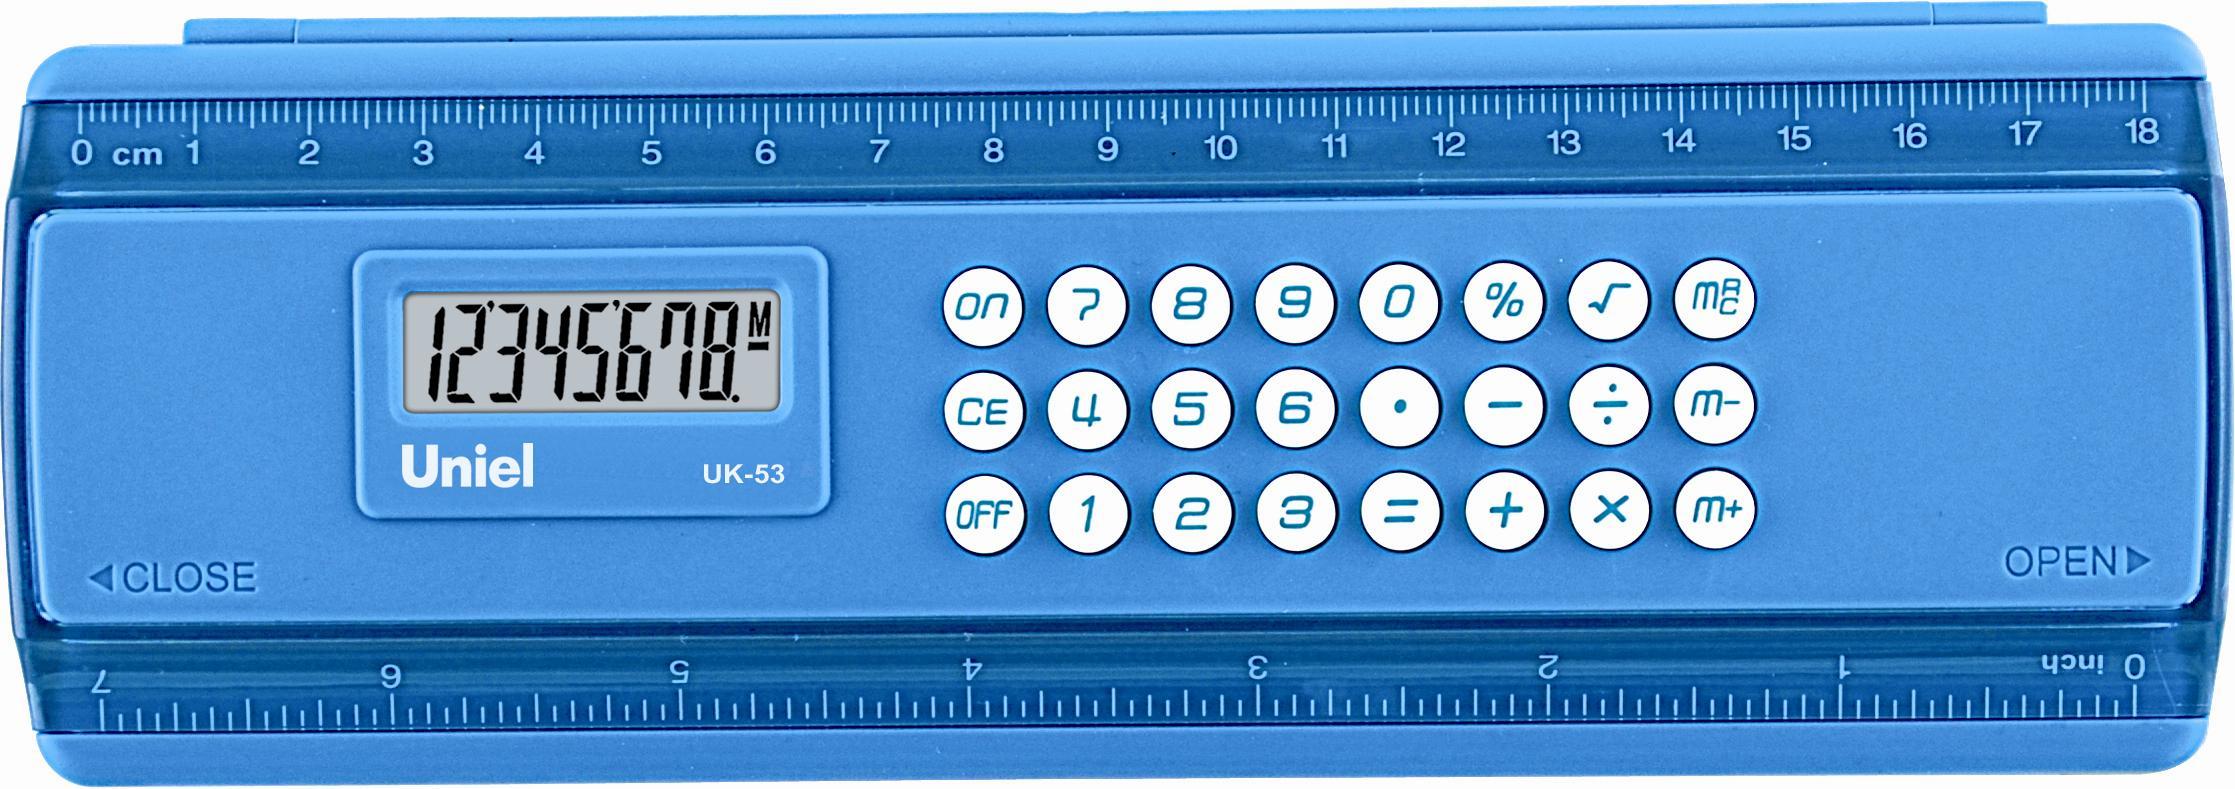 Калькулятор-пенал 8 разр. Uniel синий